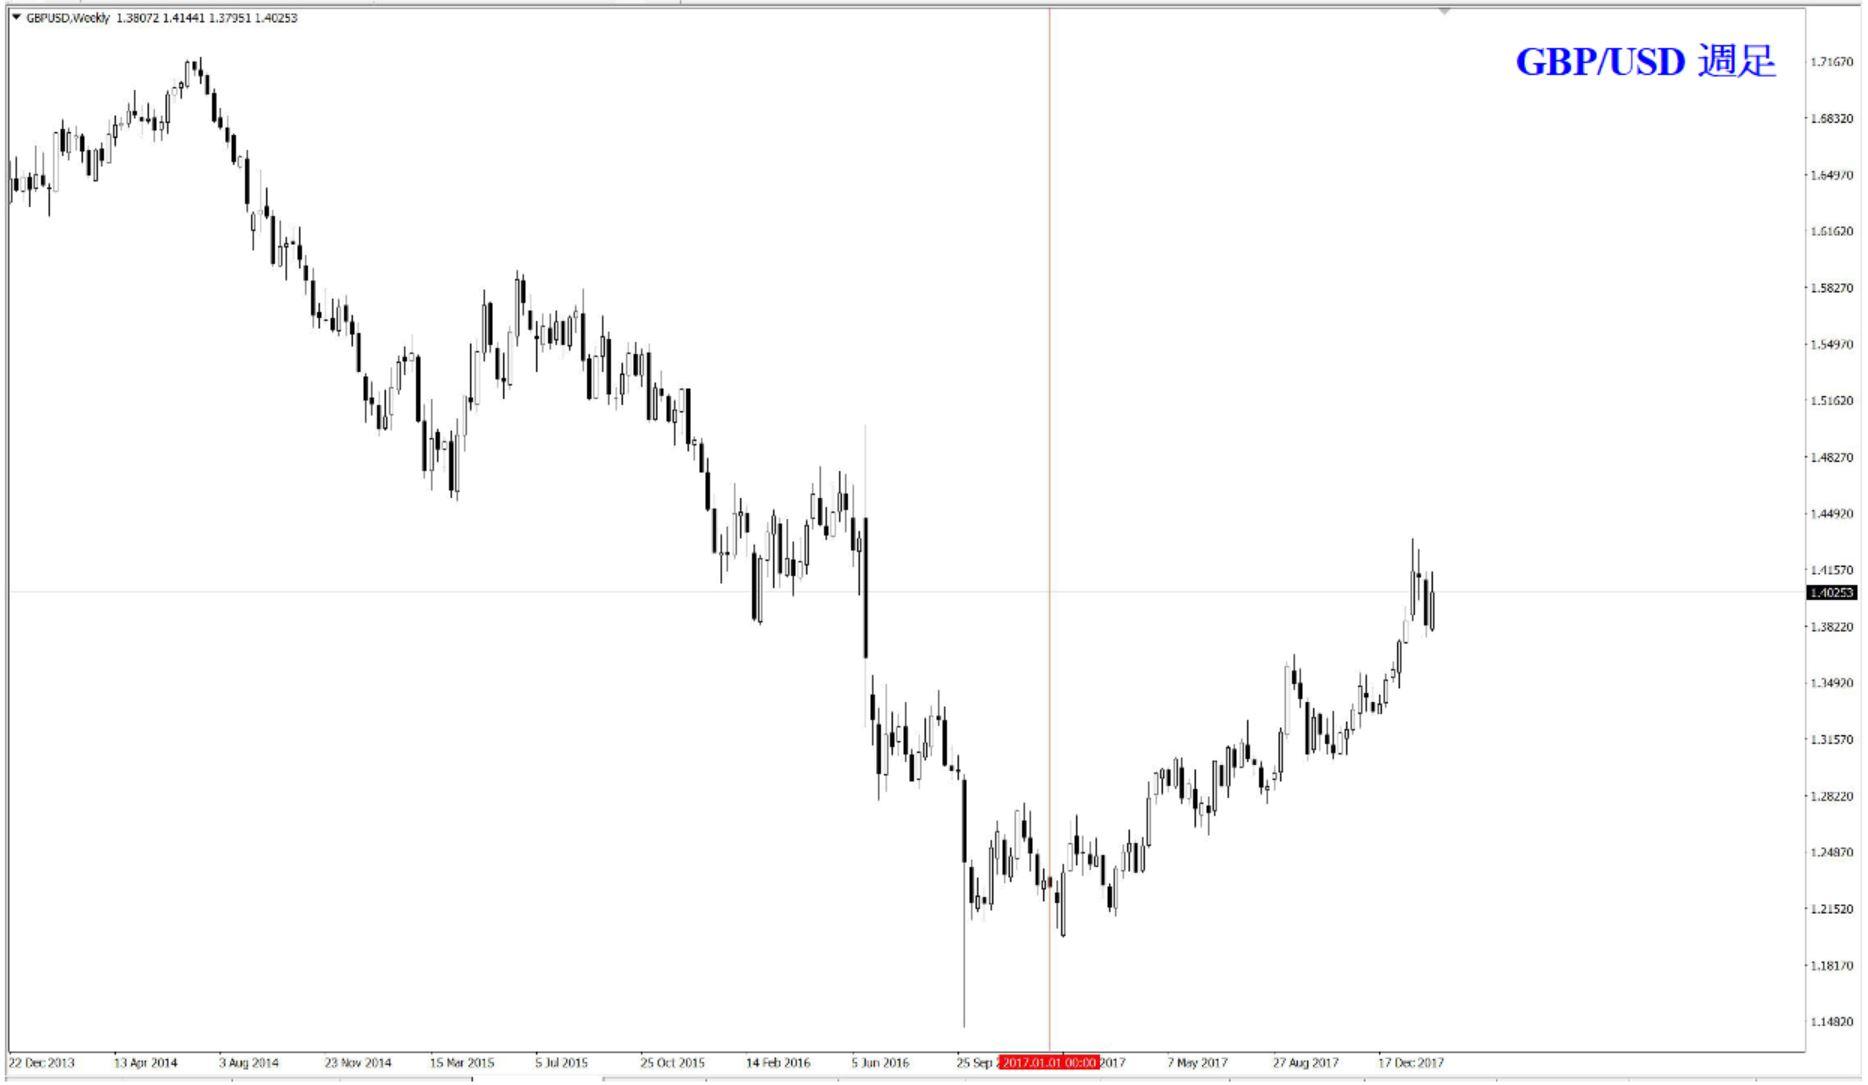 GBP/USD 週足